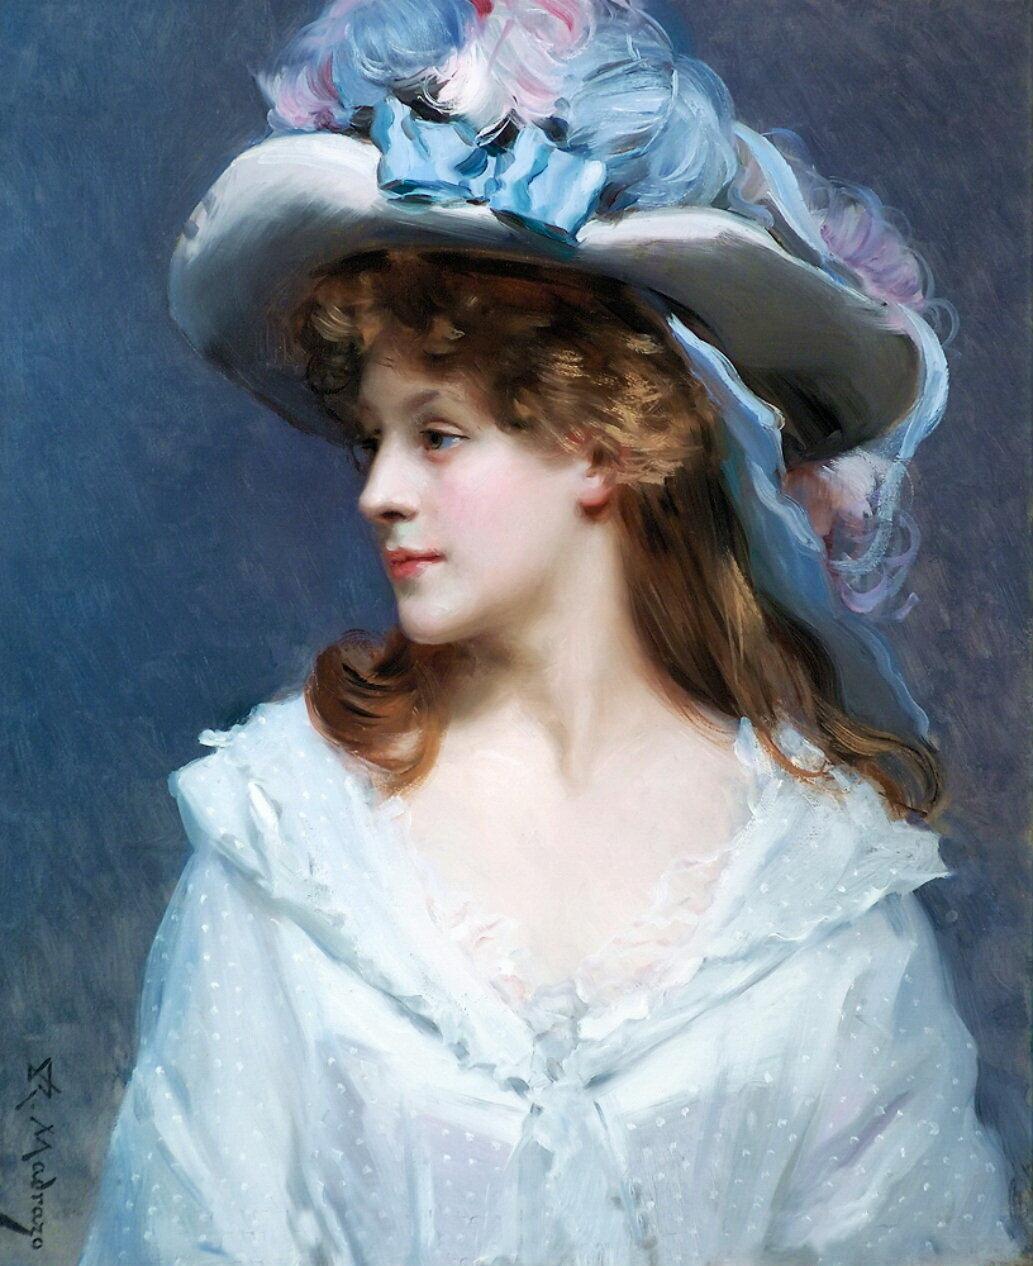 Raimundo de Madrazo y Garreta (1841-1920) - Woman in White